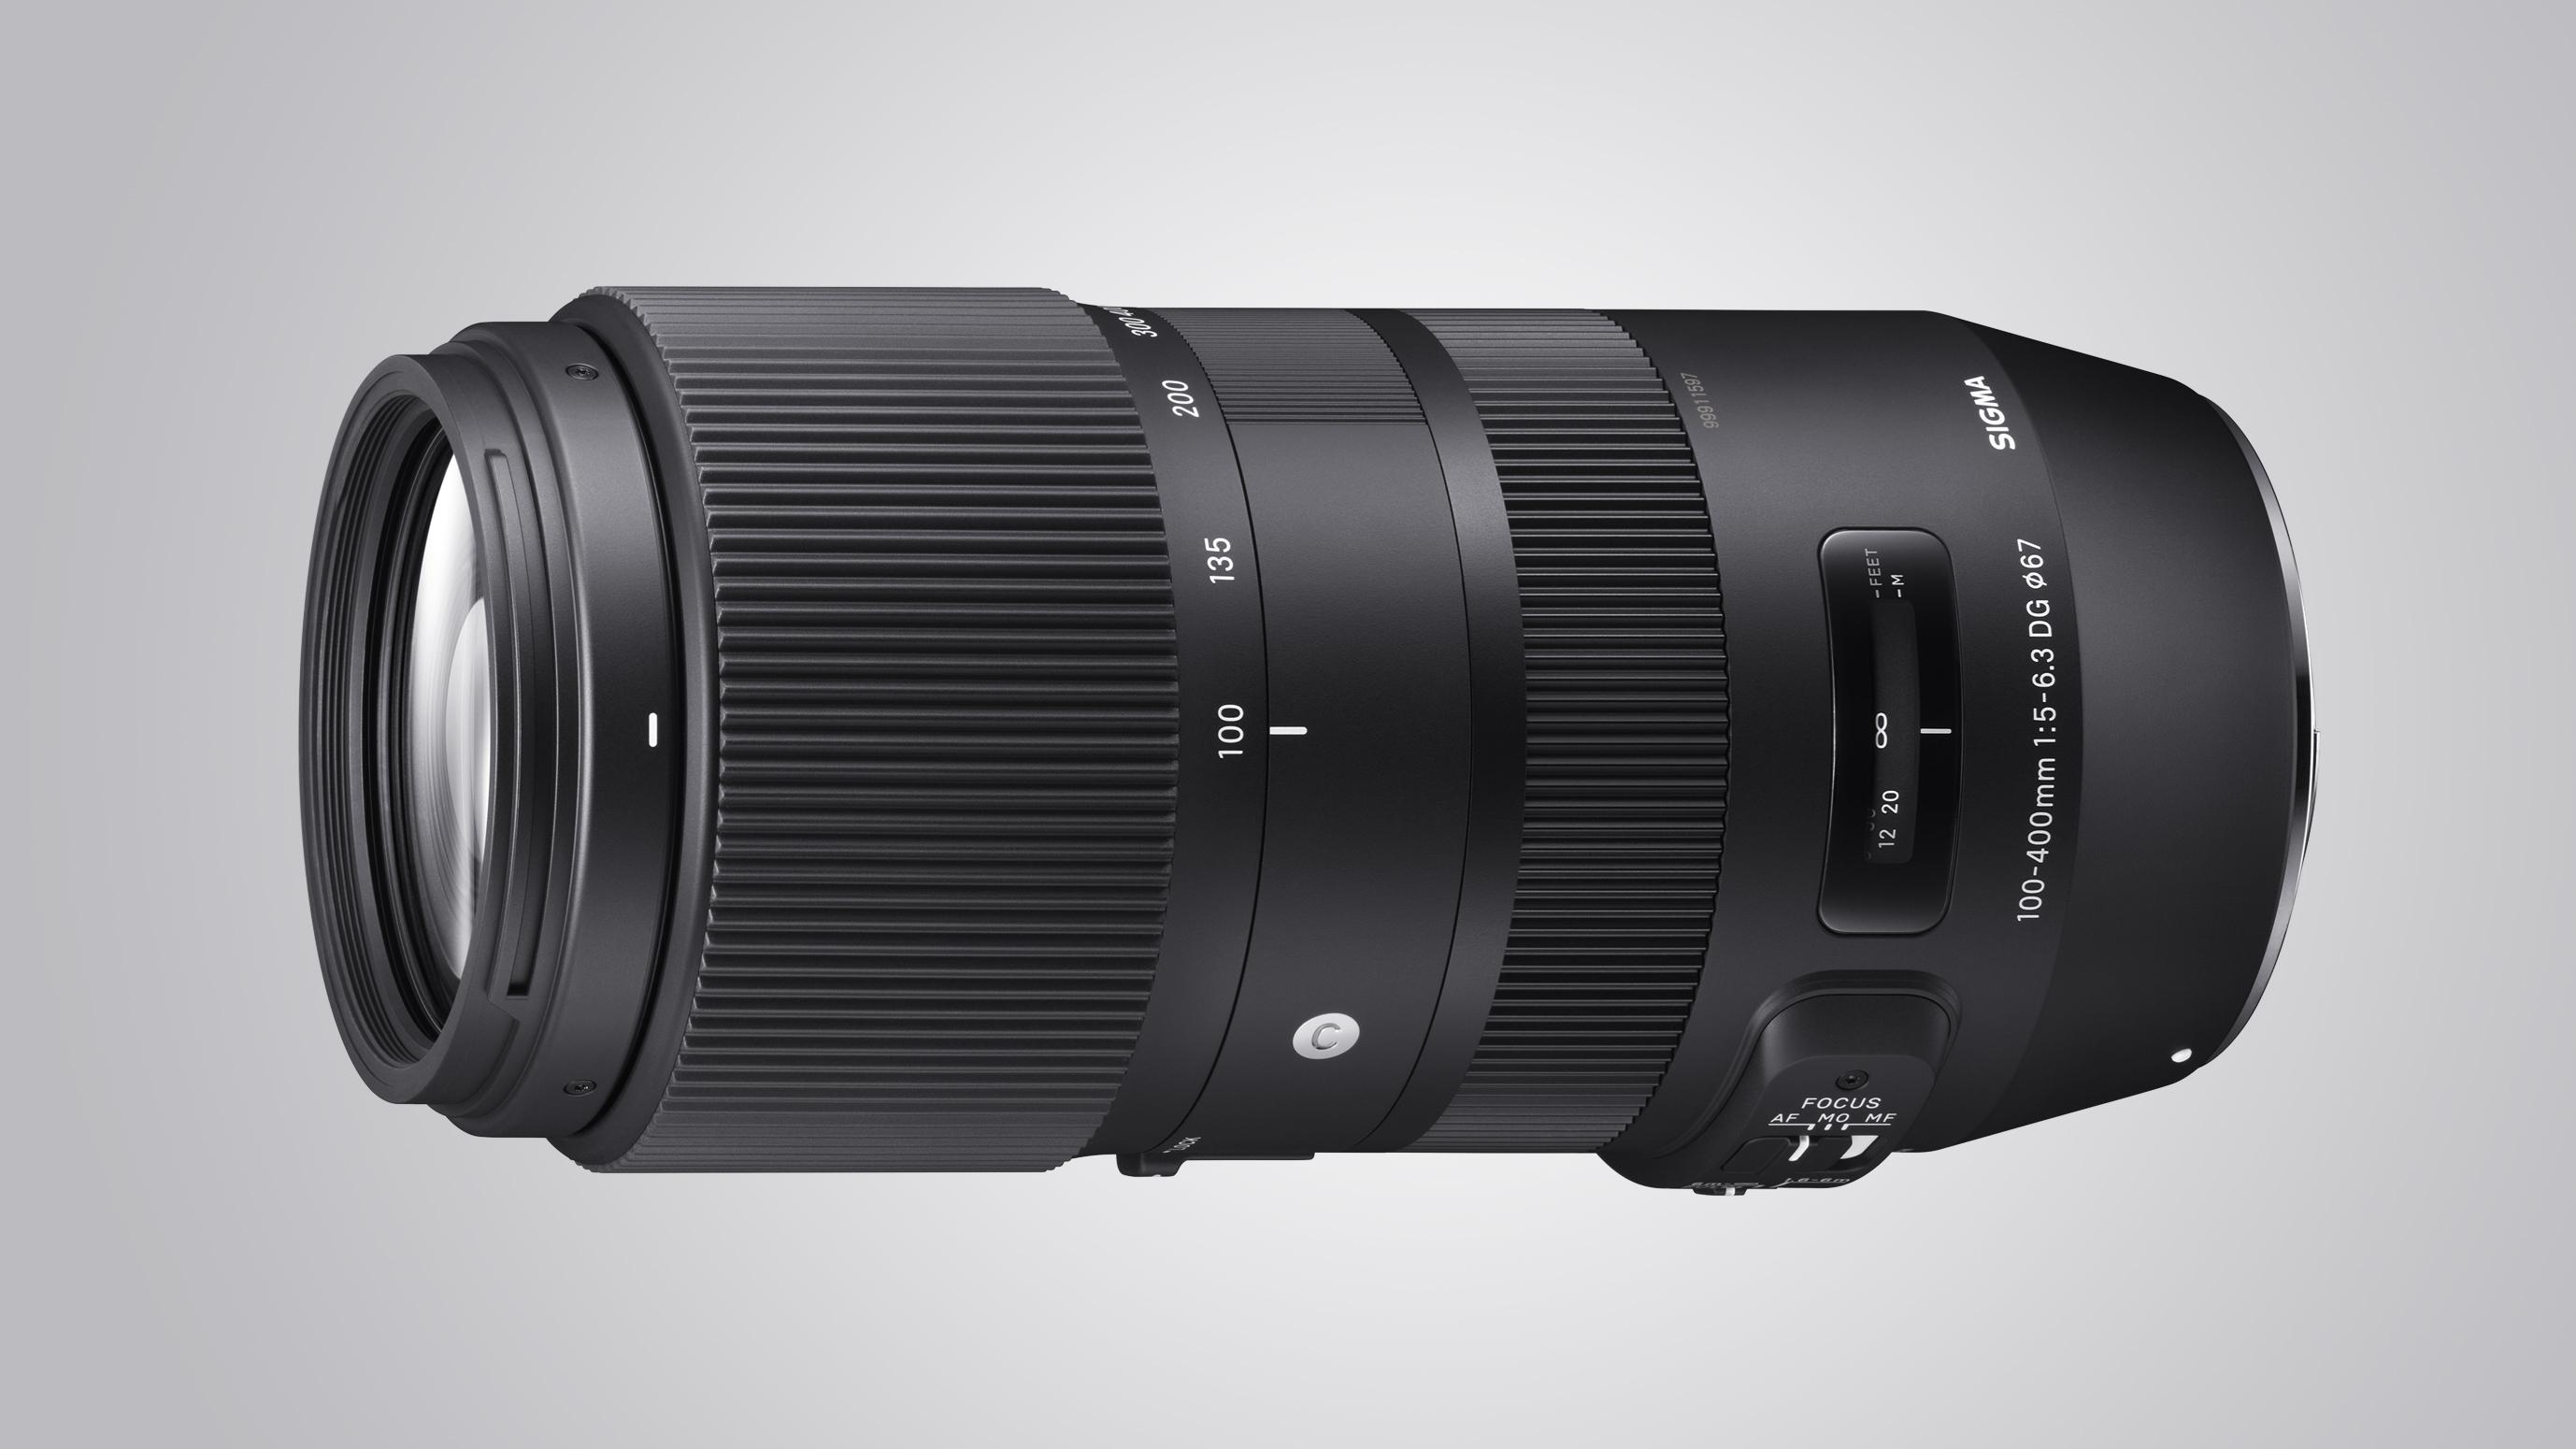 Sigma 100-400mm f/5-6.3 DG OS HSM | C